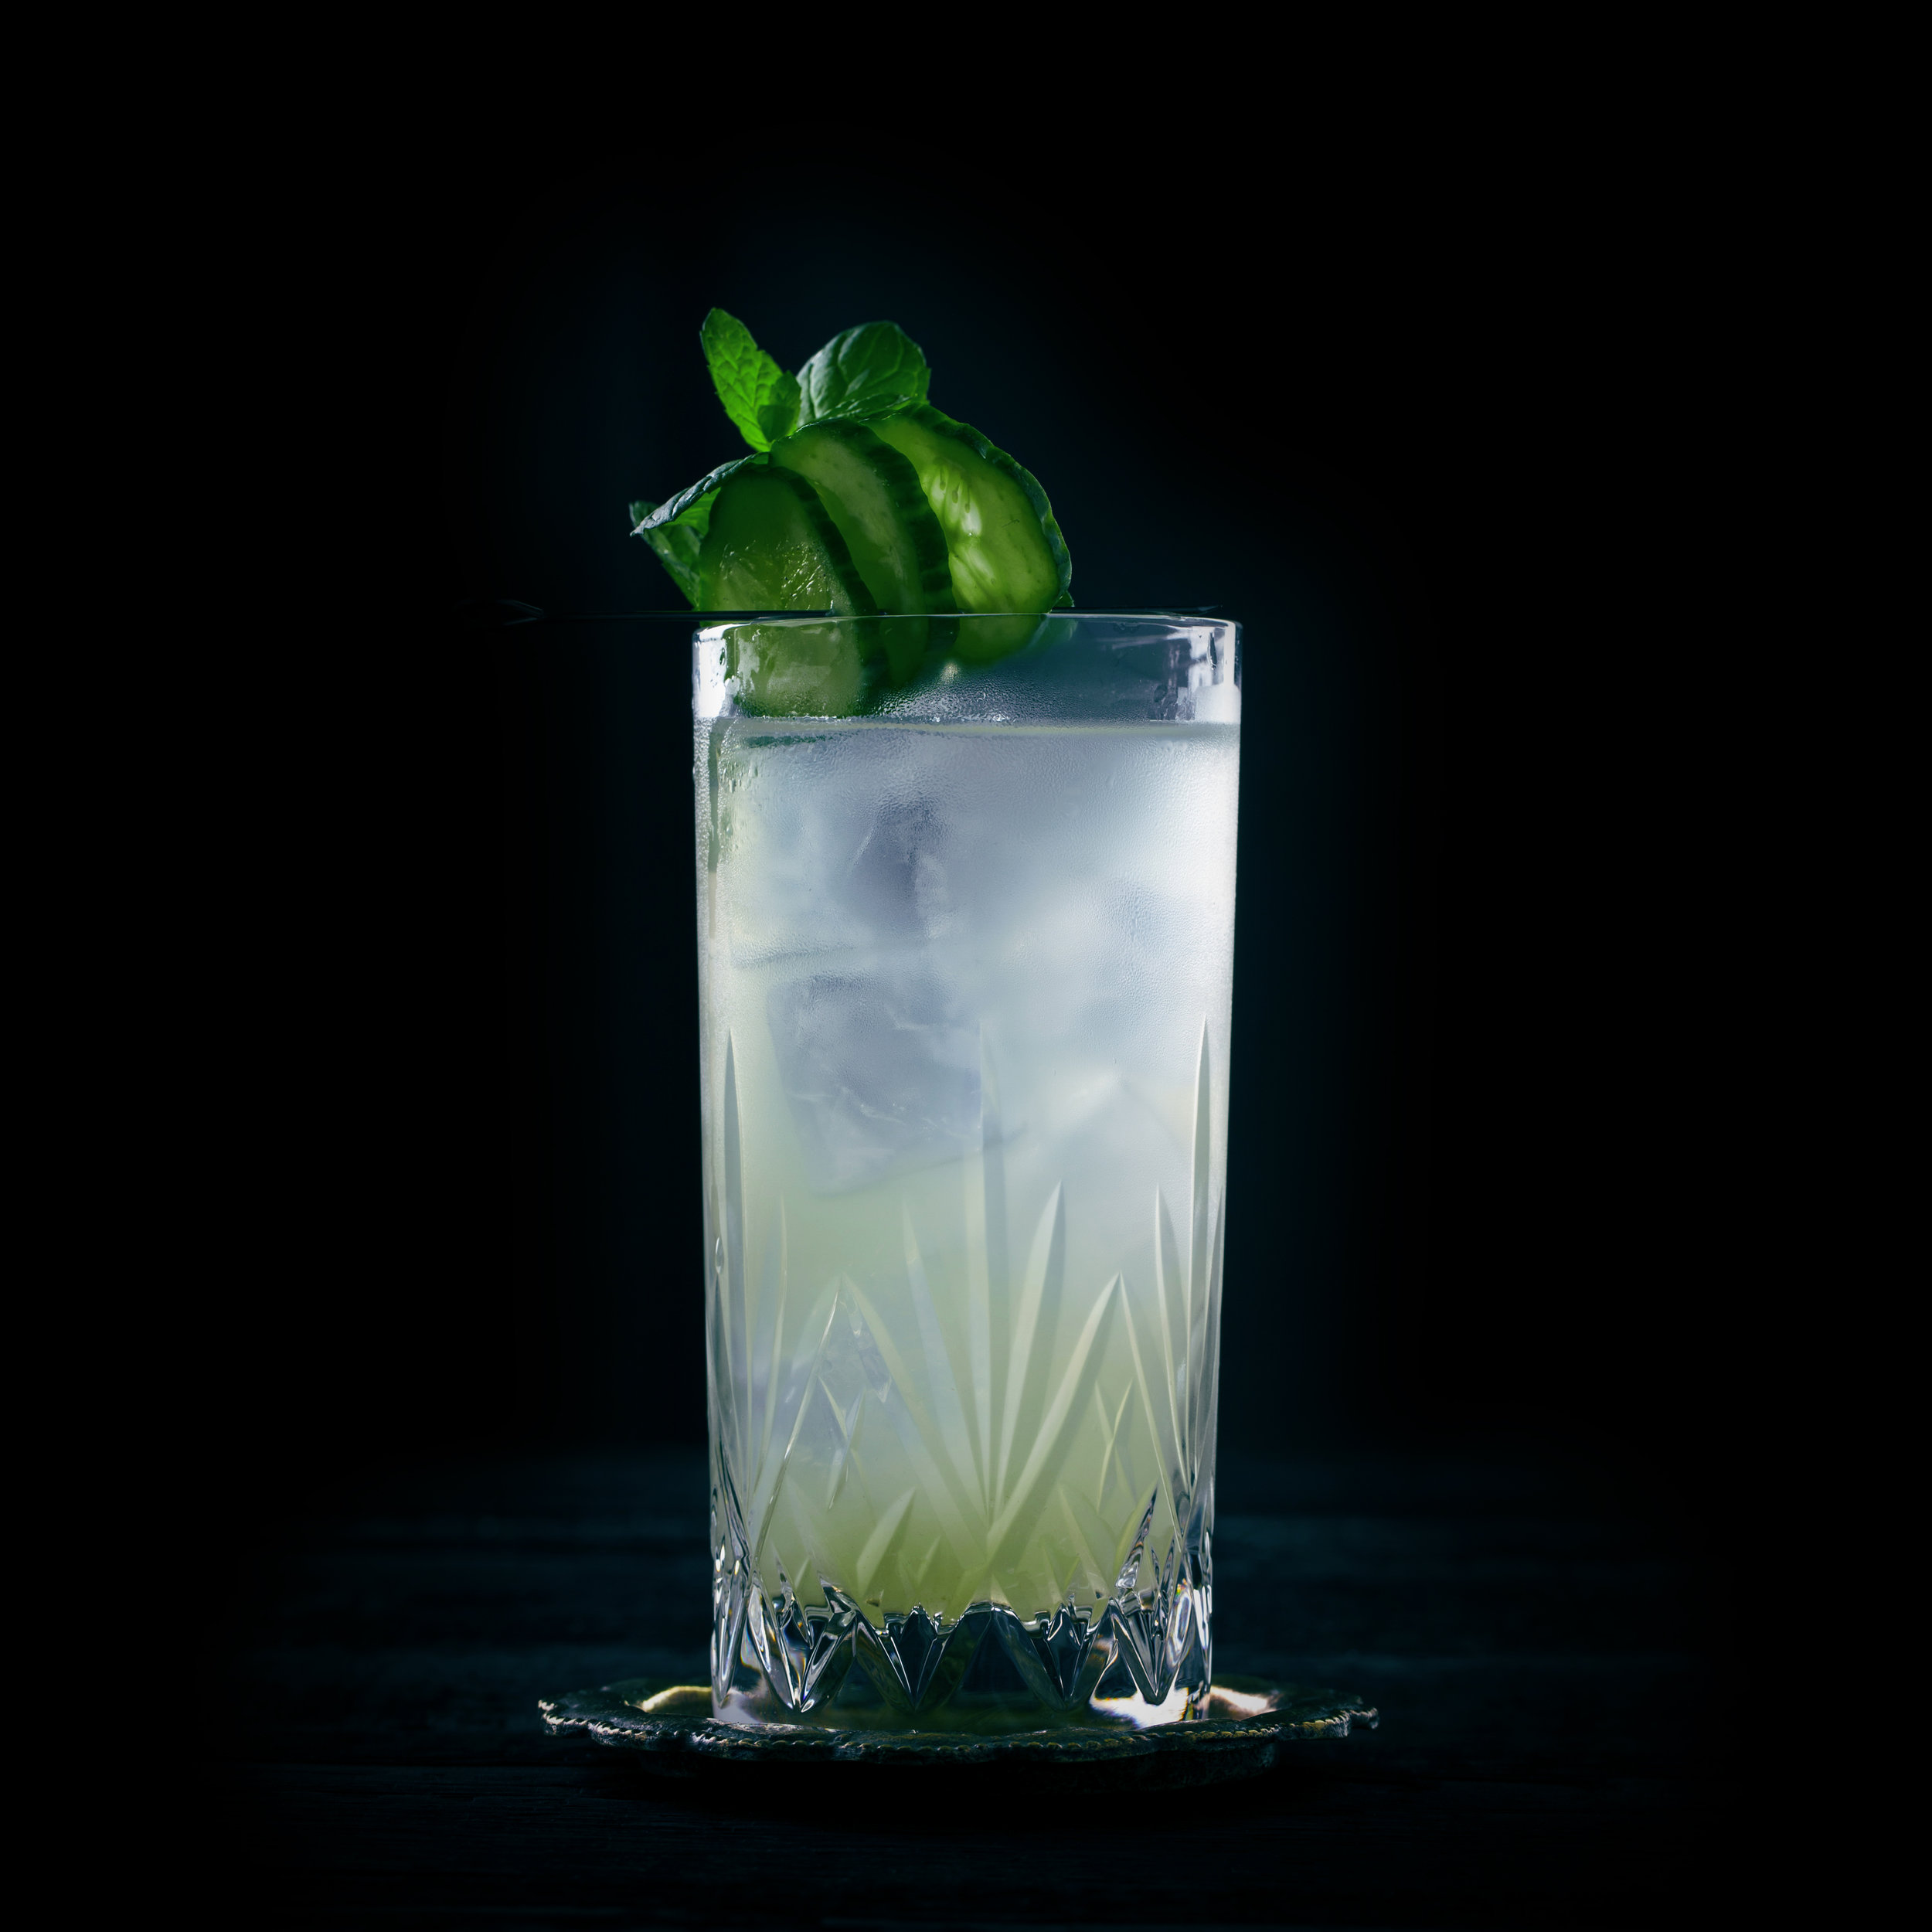 THE MINTY  INGREDIENTS  - 1.5 oz. El Silencio Espadin - 1 oz. Fresh Lime Juice - 3 oz Juiced Cucumber - Fresh mint  METHOD  Muddle Mint - Add additional ingredients  Shake with Ice & Strain  Garnish: Cucumber Wheel & Mint